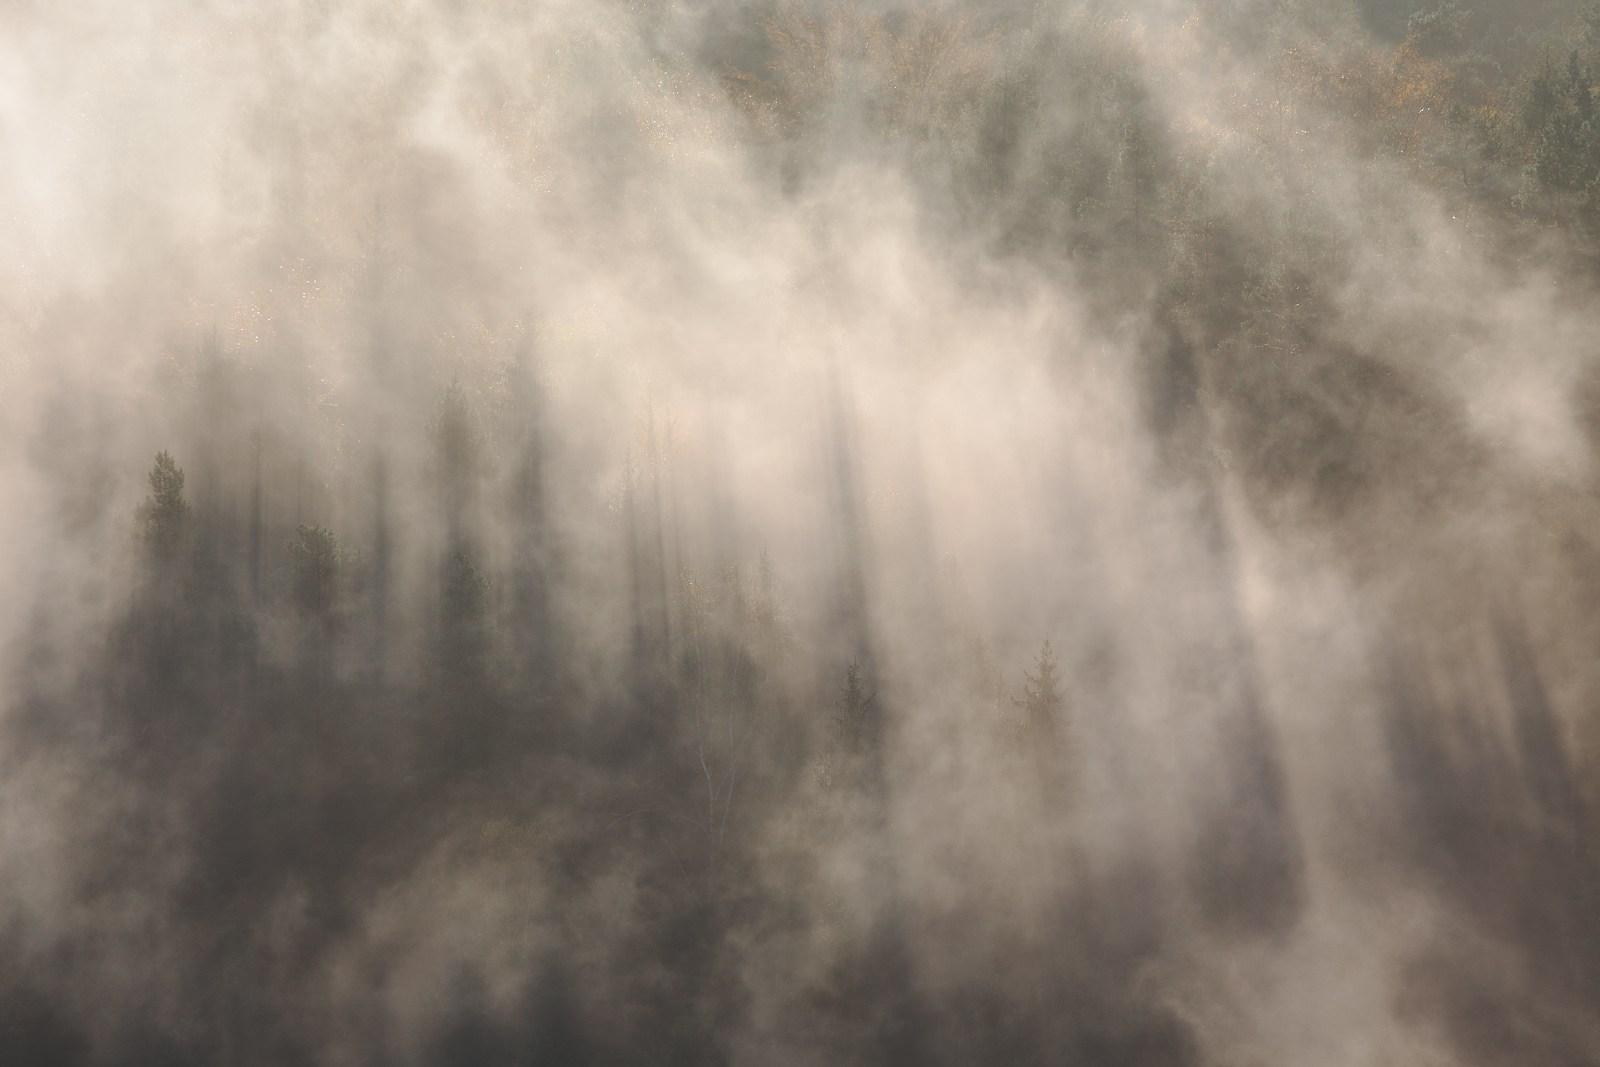 Shadows of spruce trees in heavy fog